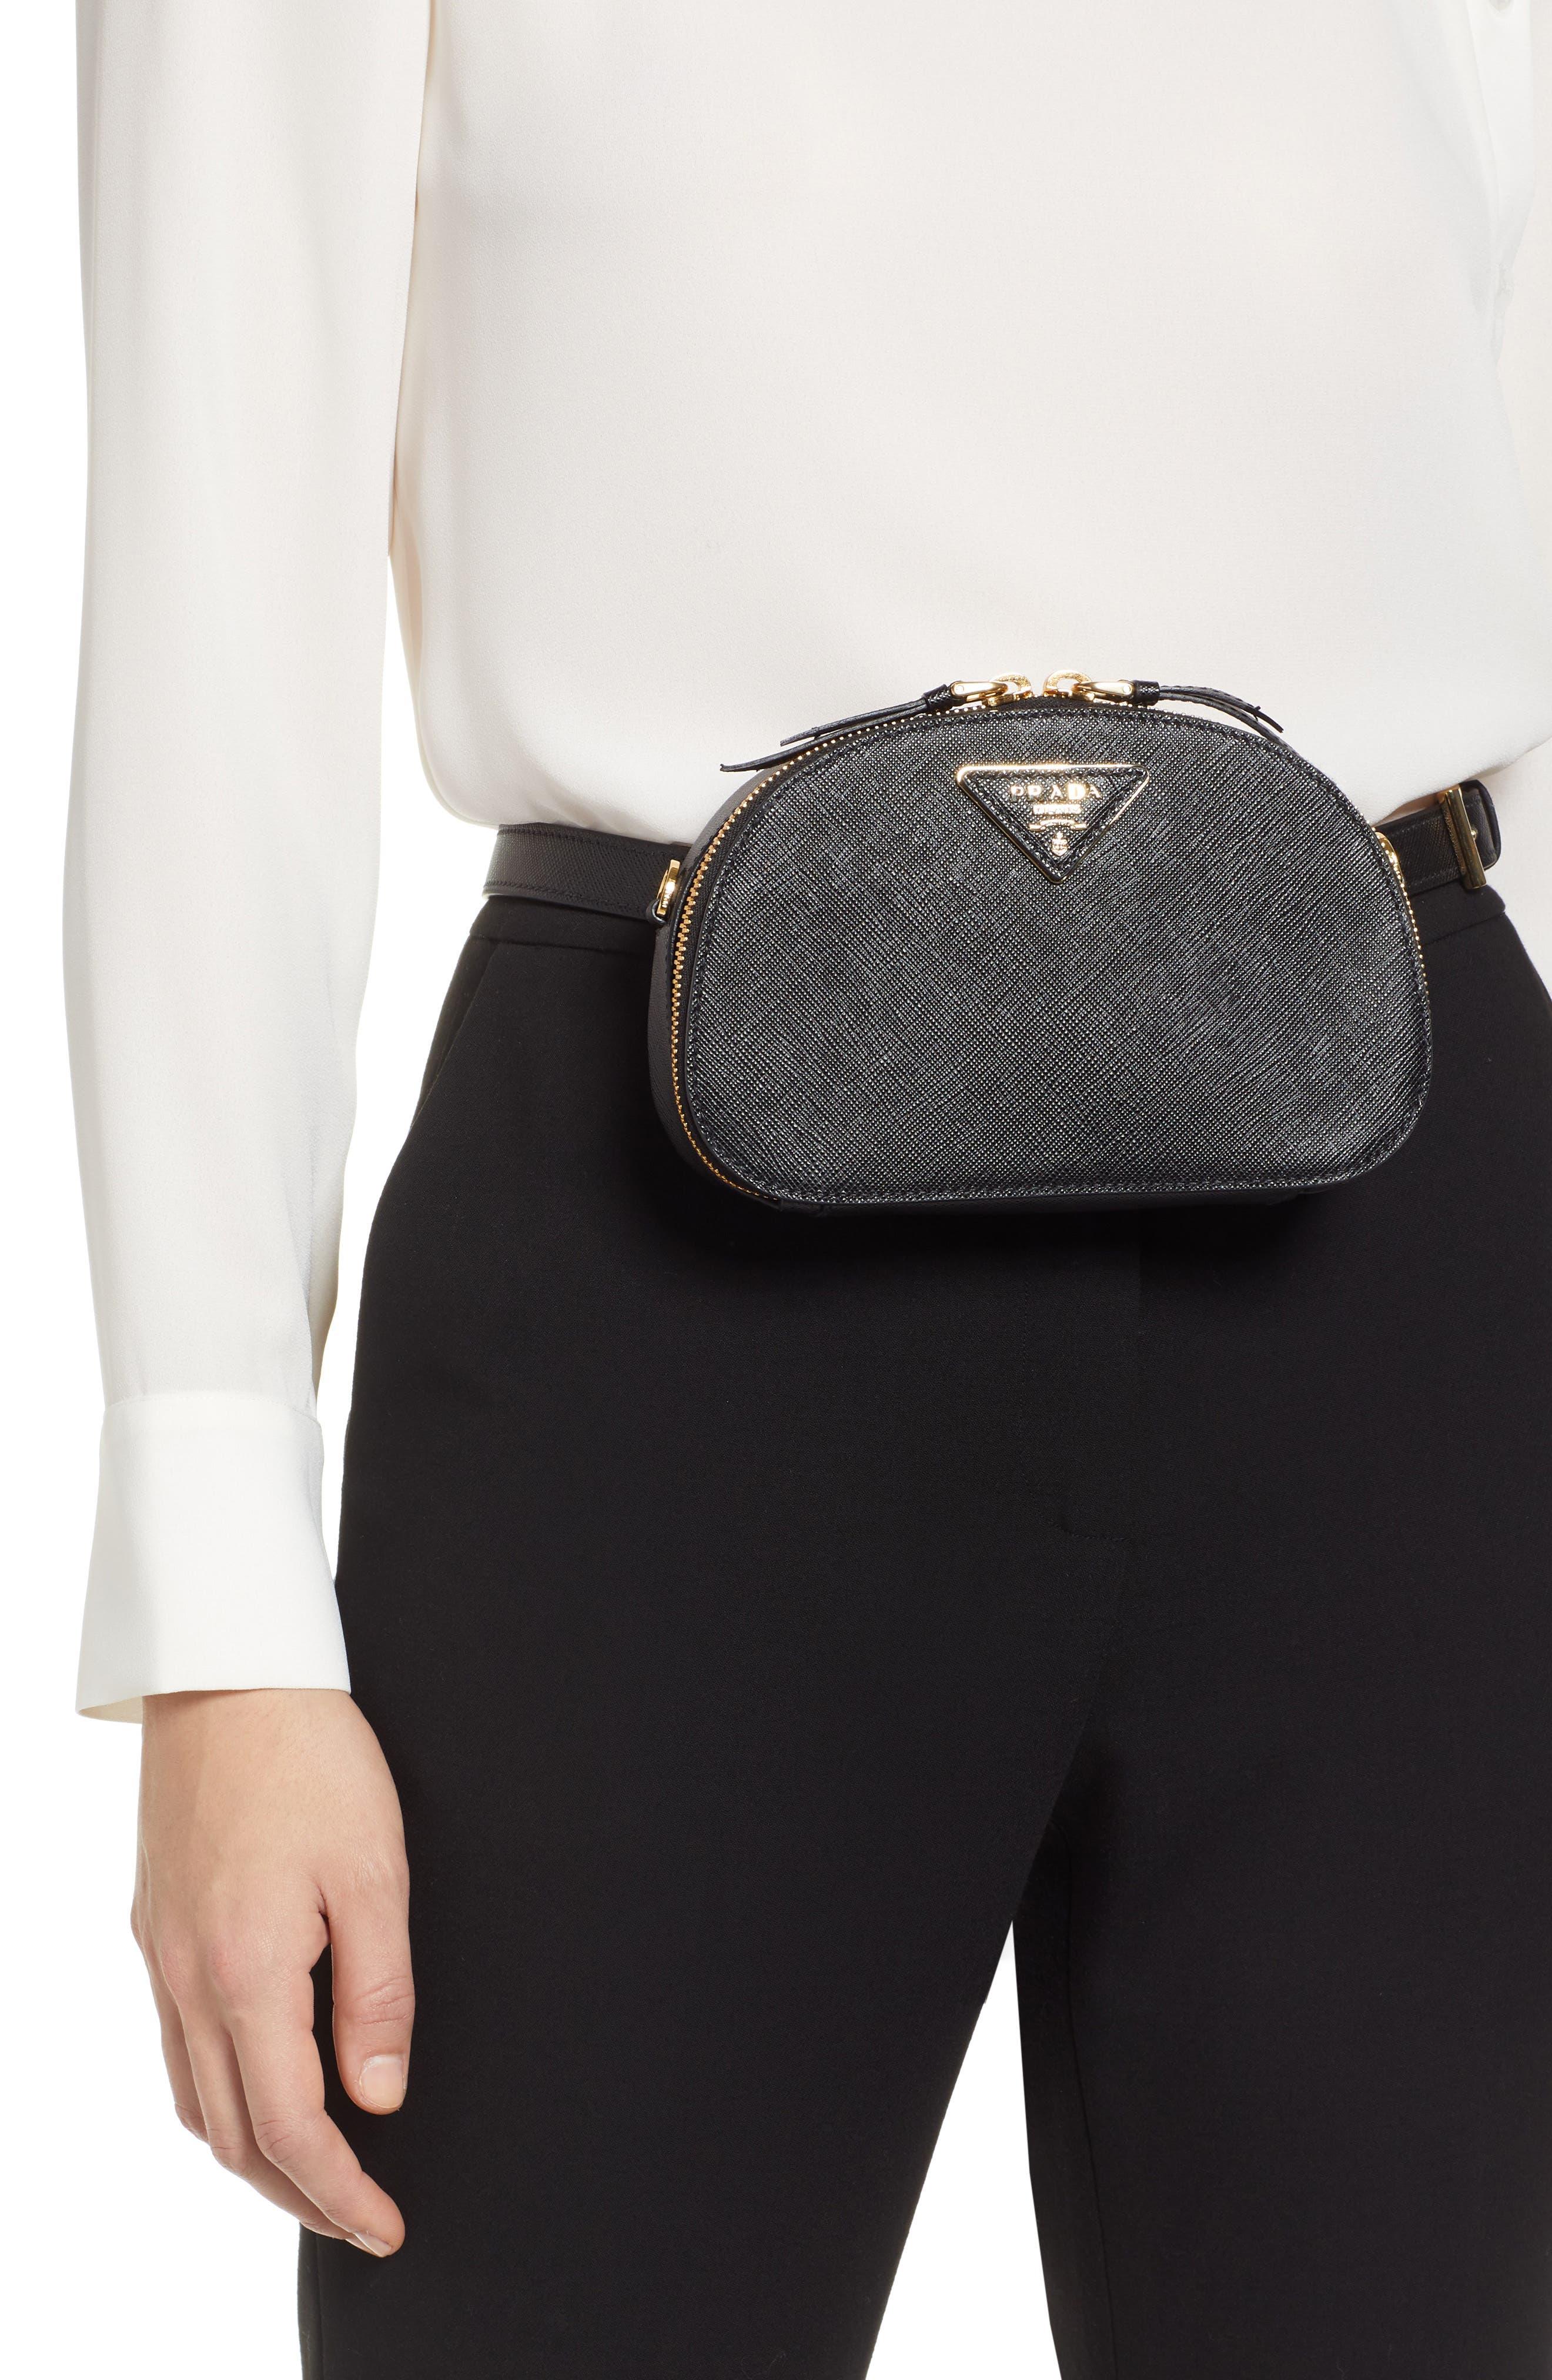 PRADA, Saffiano Leather Belt Bag, Alternate thumbnail 2, color, 001